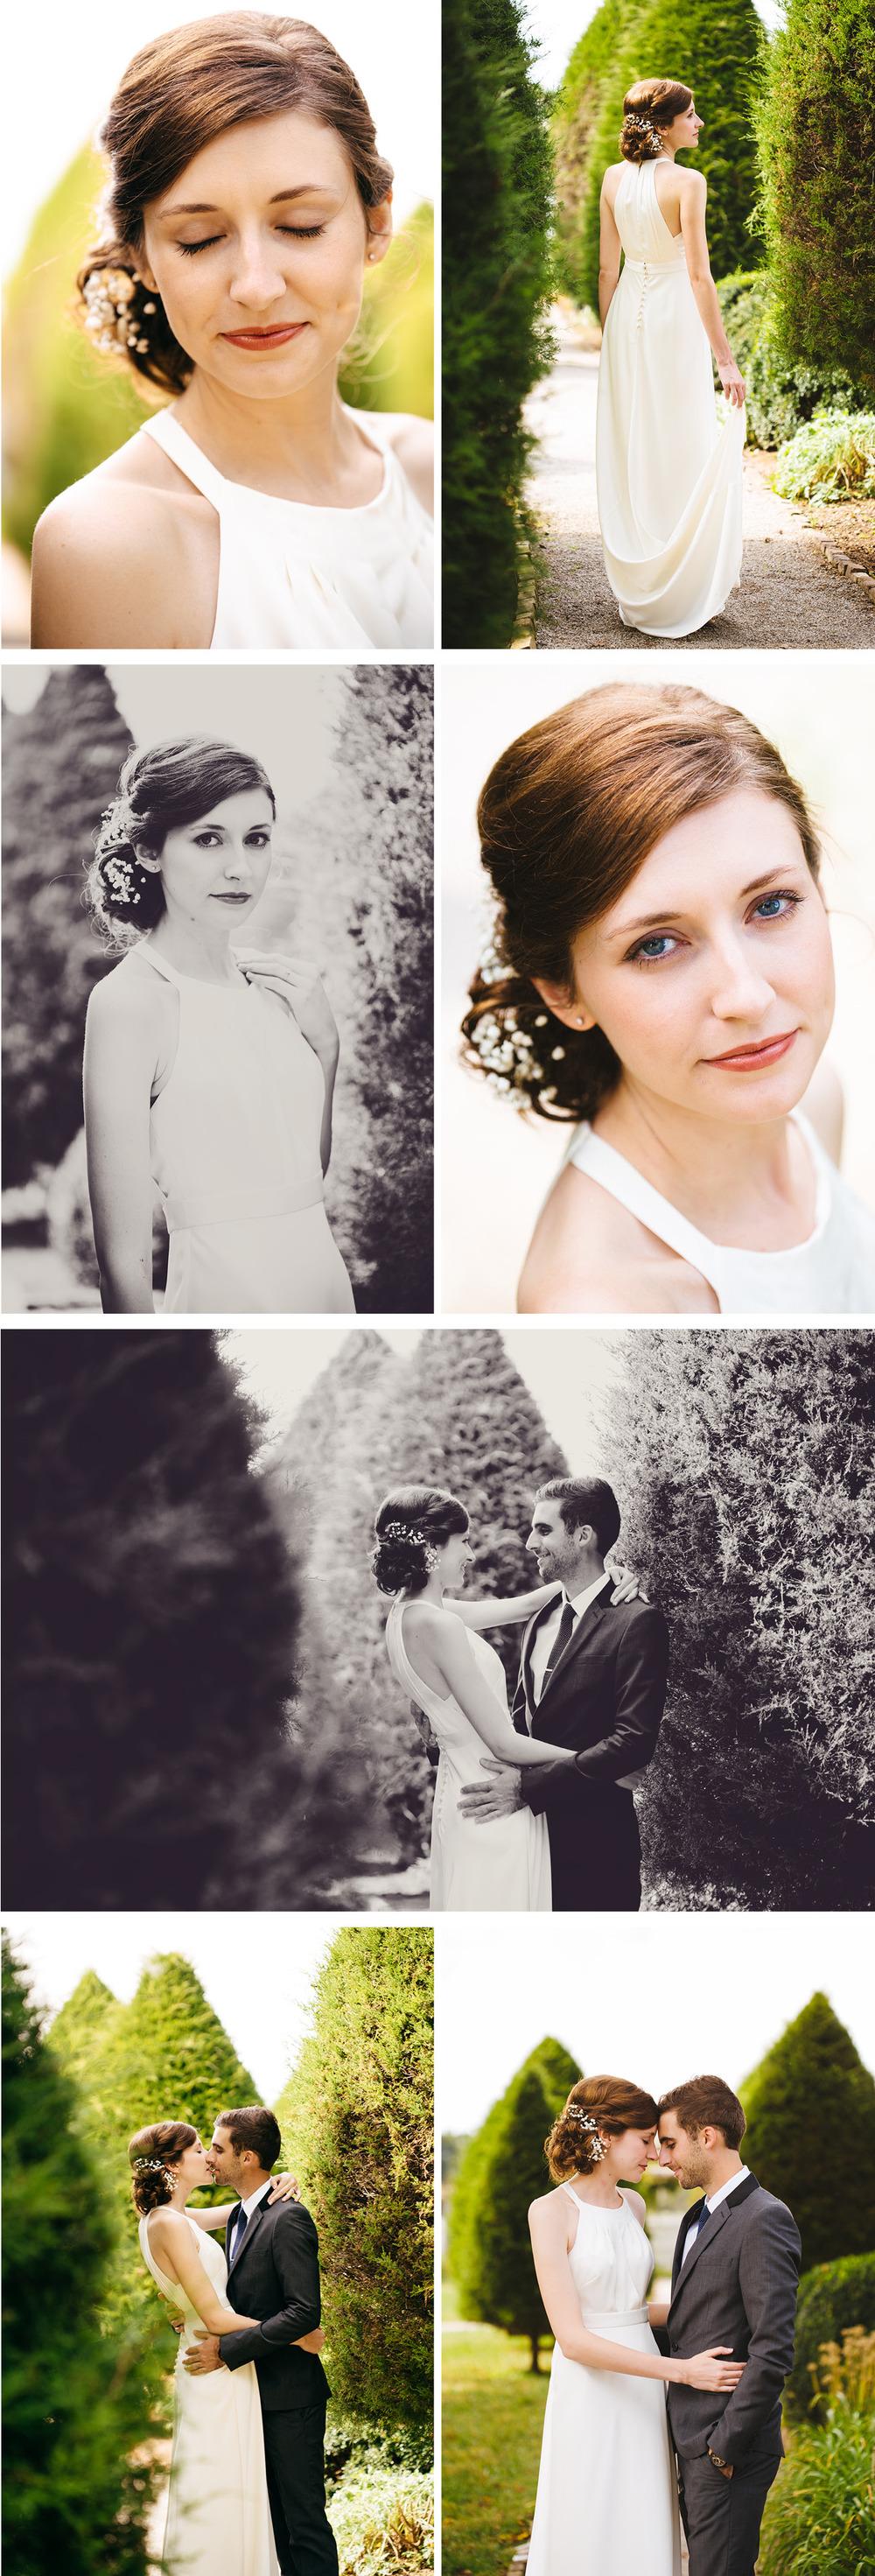 CK-Photo-Nashville-Wedding-Photographer-TN3.jpg